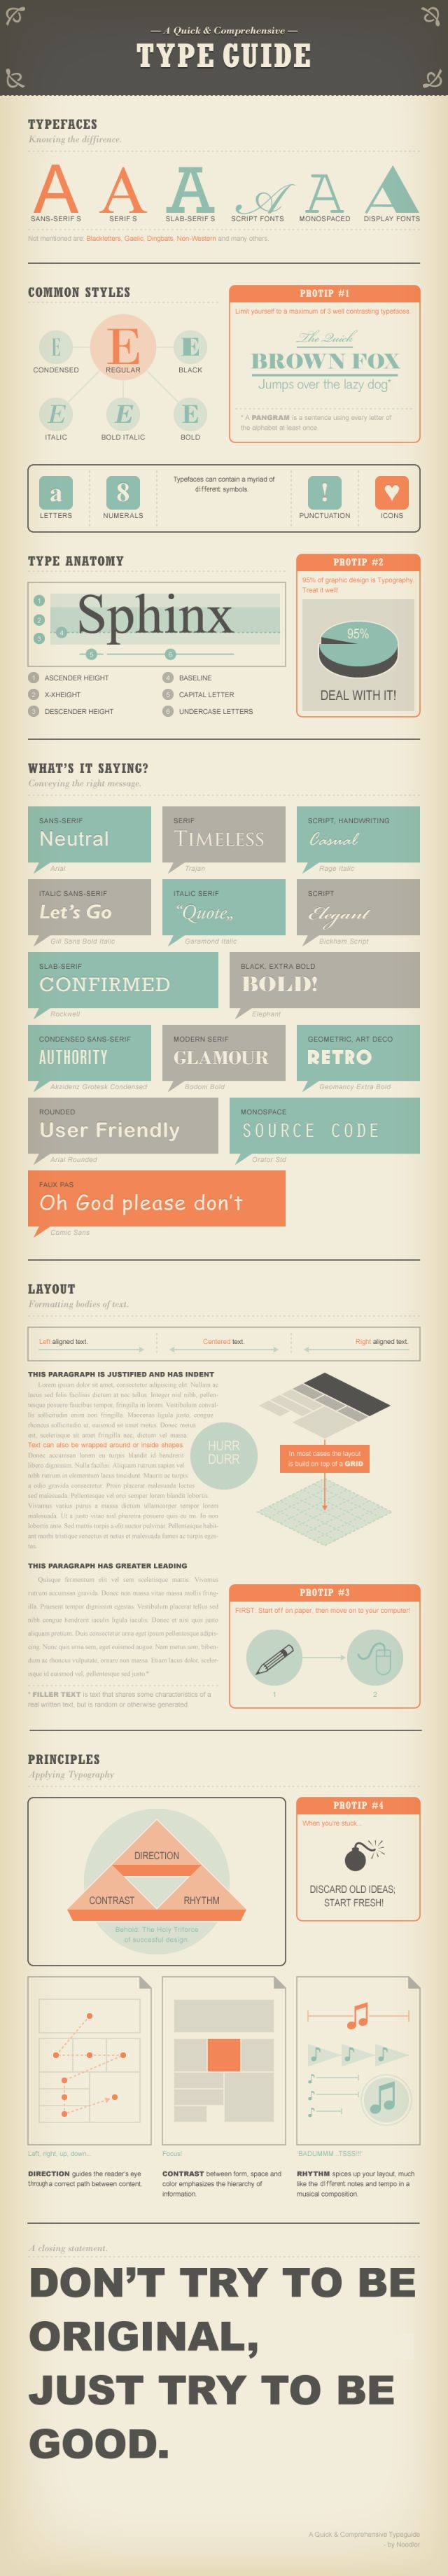 315 best Graphic Design images on Pinterest